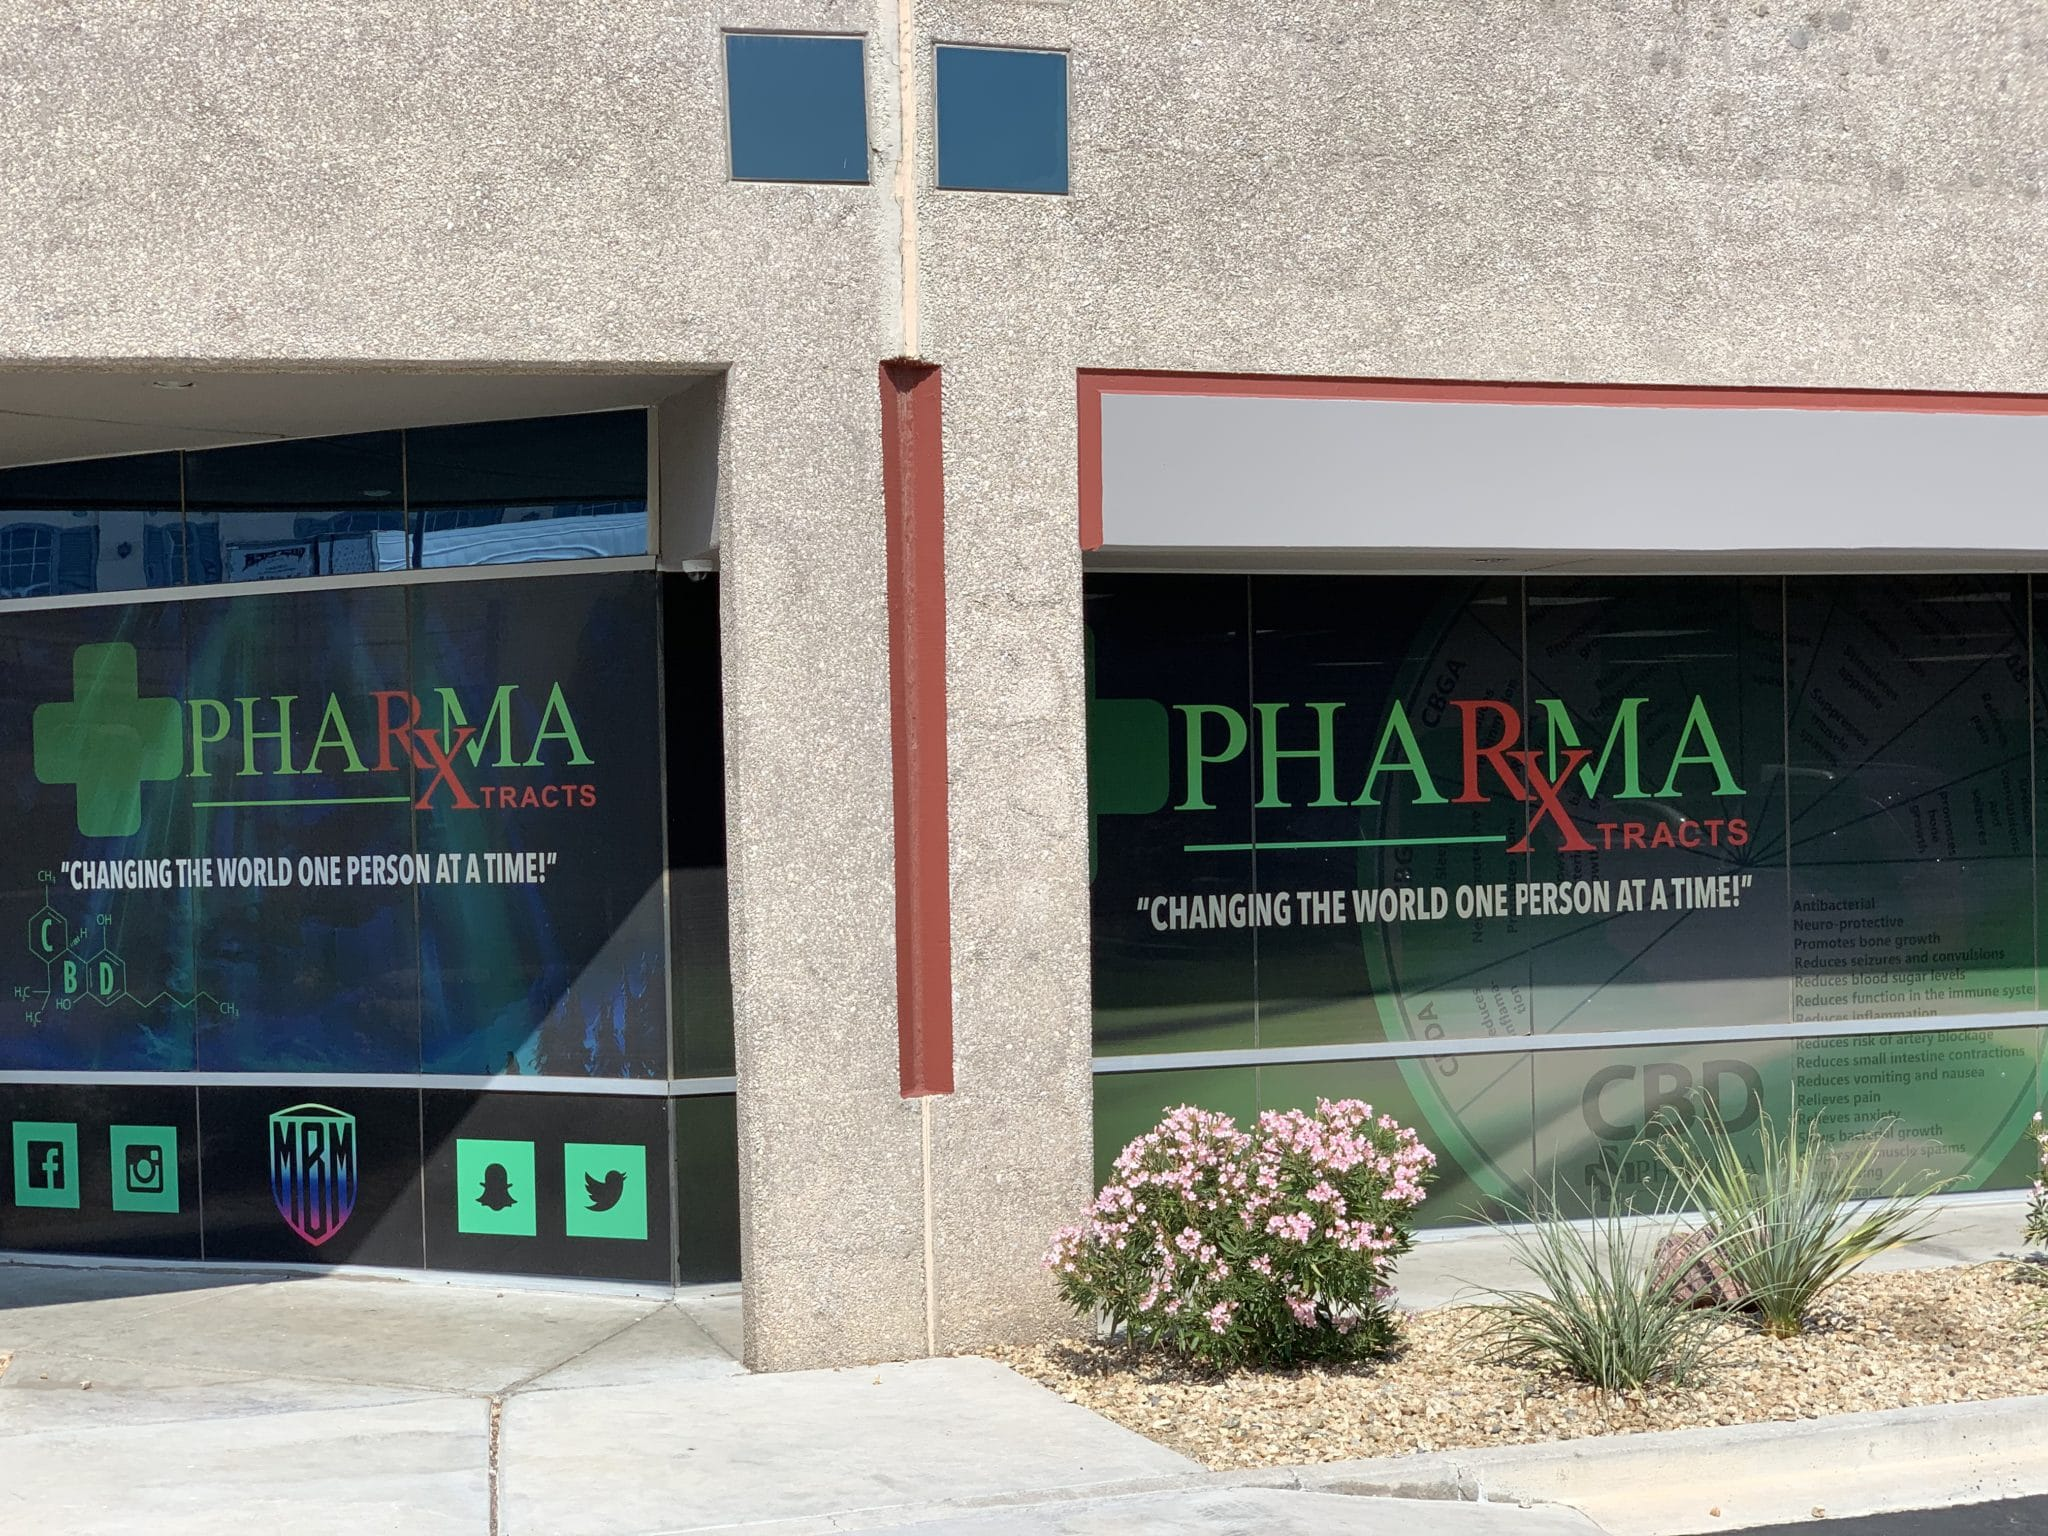 PharmaXtracts